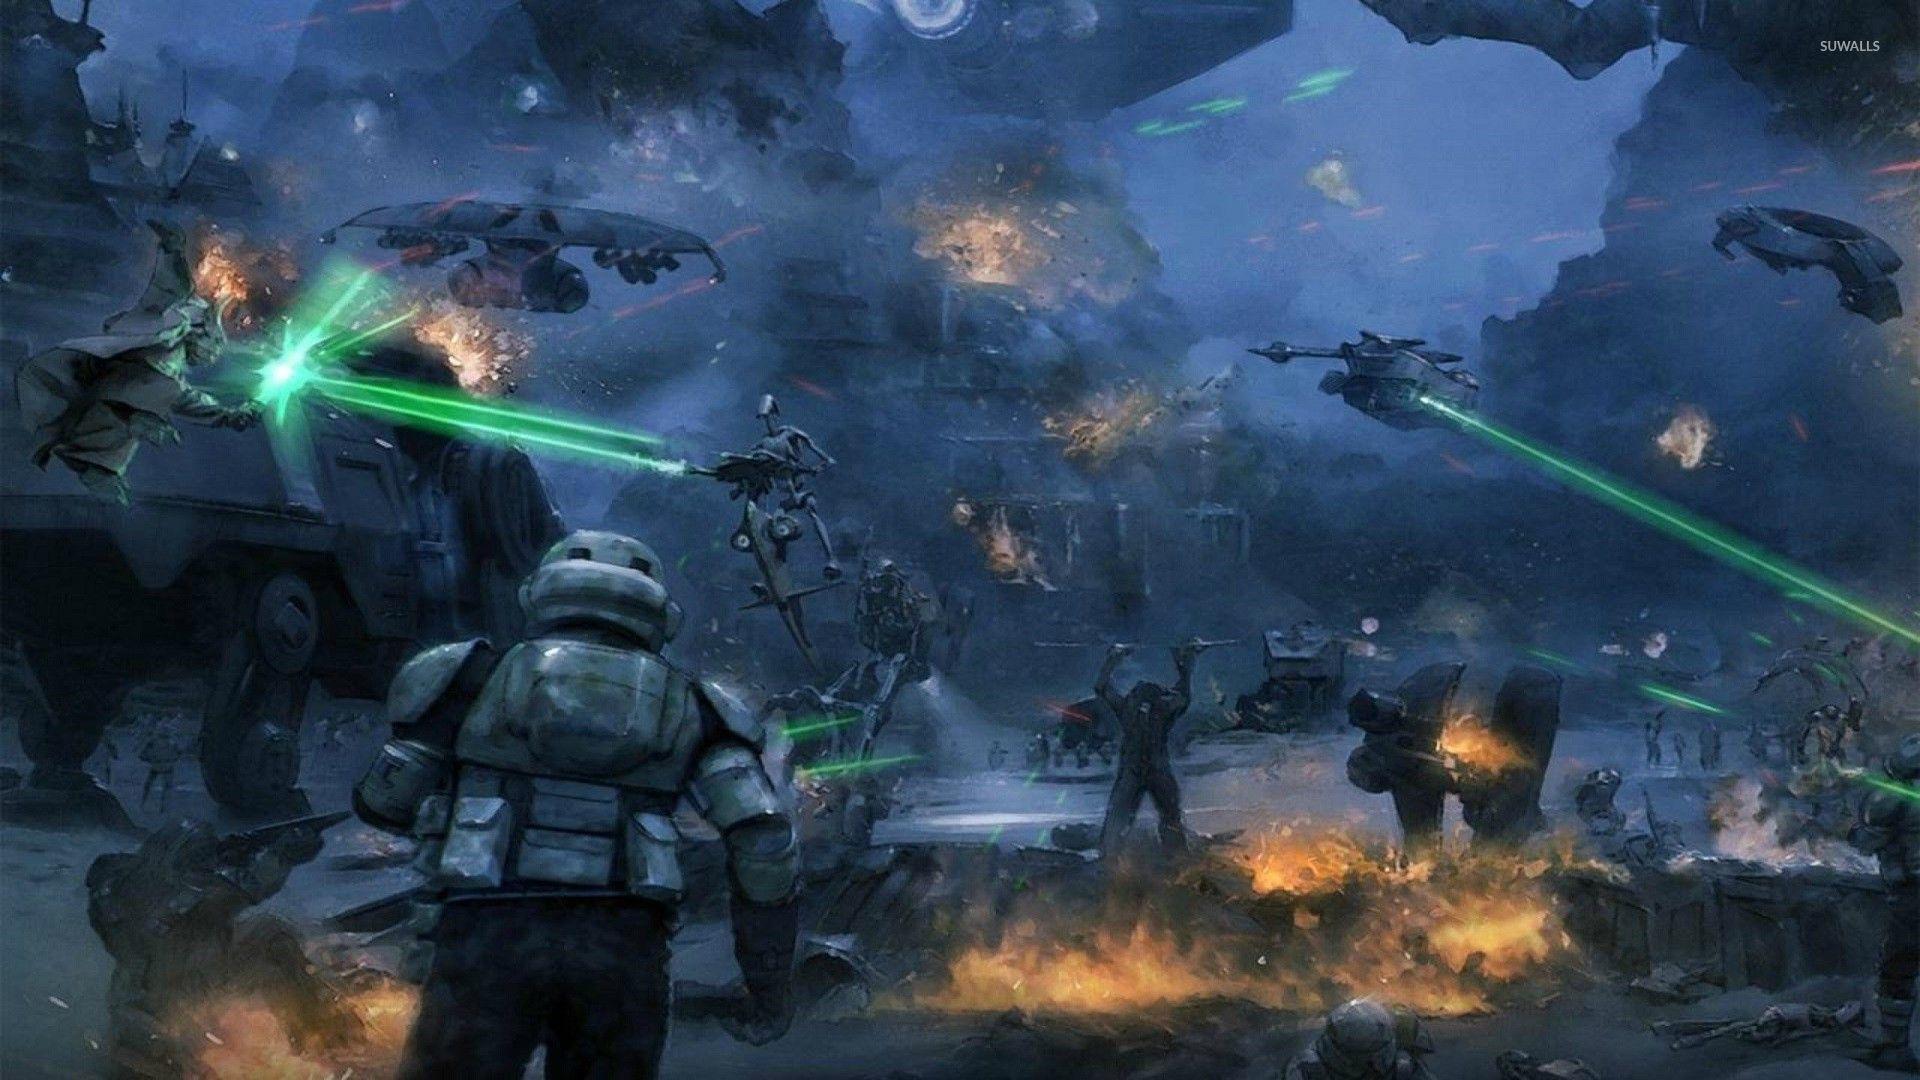 Free download Star Wars Battlefront